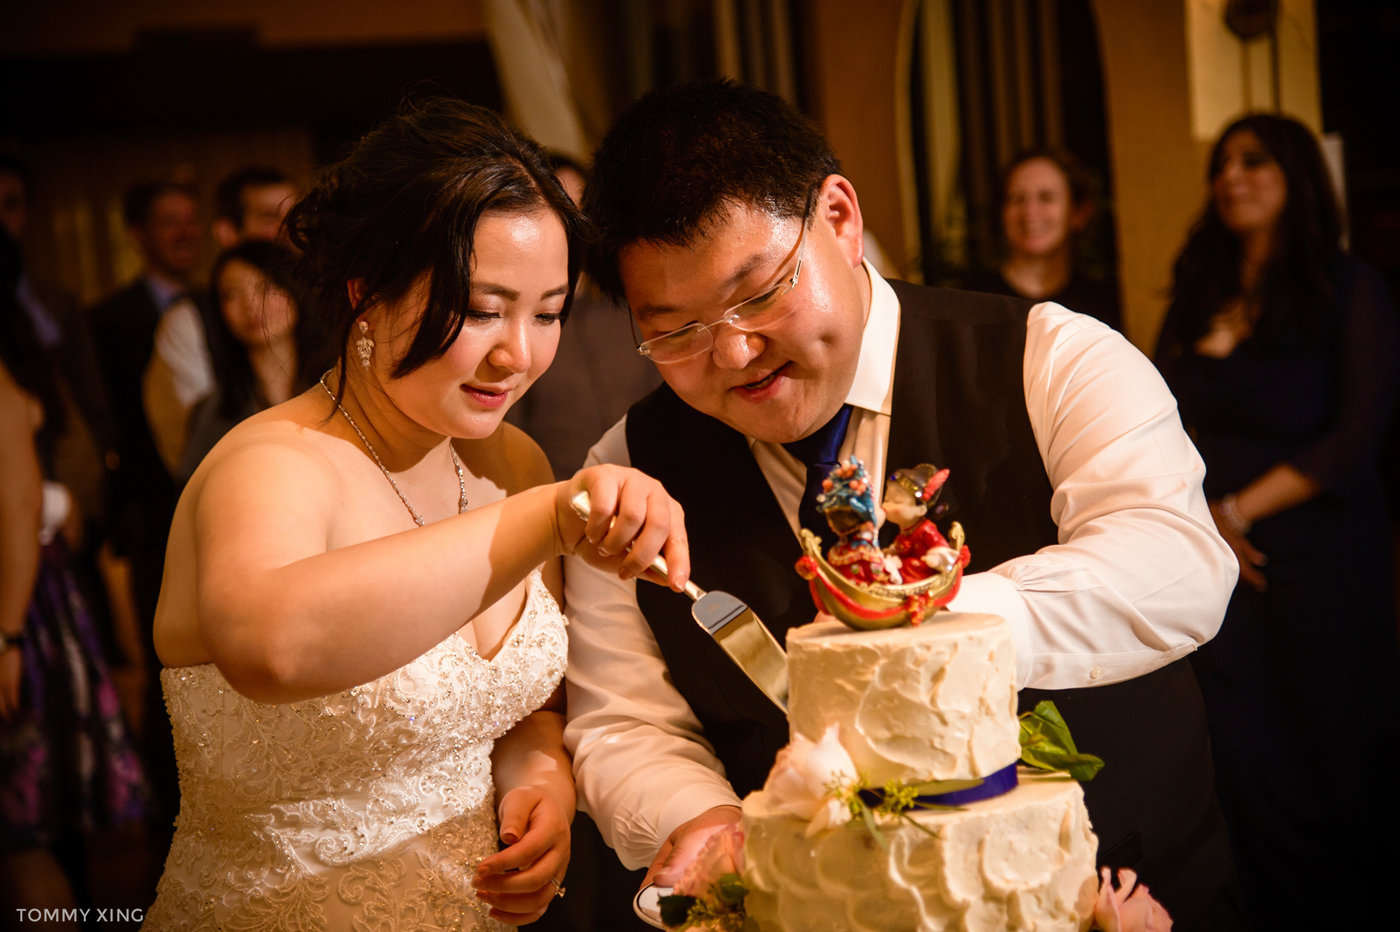 STANFORD MEMORIAL CHURCH WEDDING - Wenjie & Chengcheng - SAN FRANCISCO BAY AREA 斯坦福教堂婚礼跟拍 - 洛杉矶婚礼婚纱照摄影师 Tommy Xing Photography235.jpg